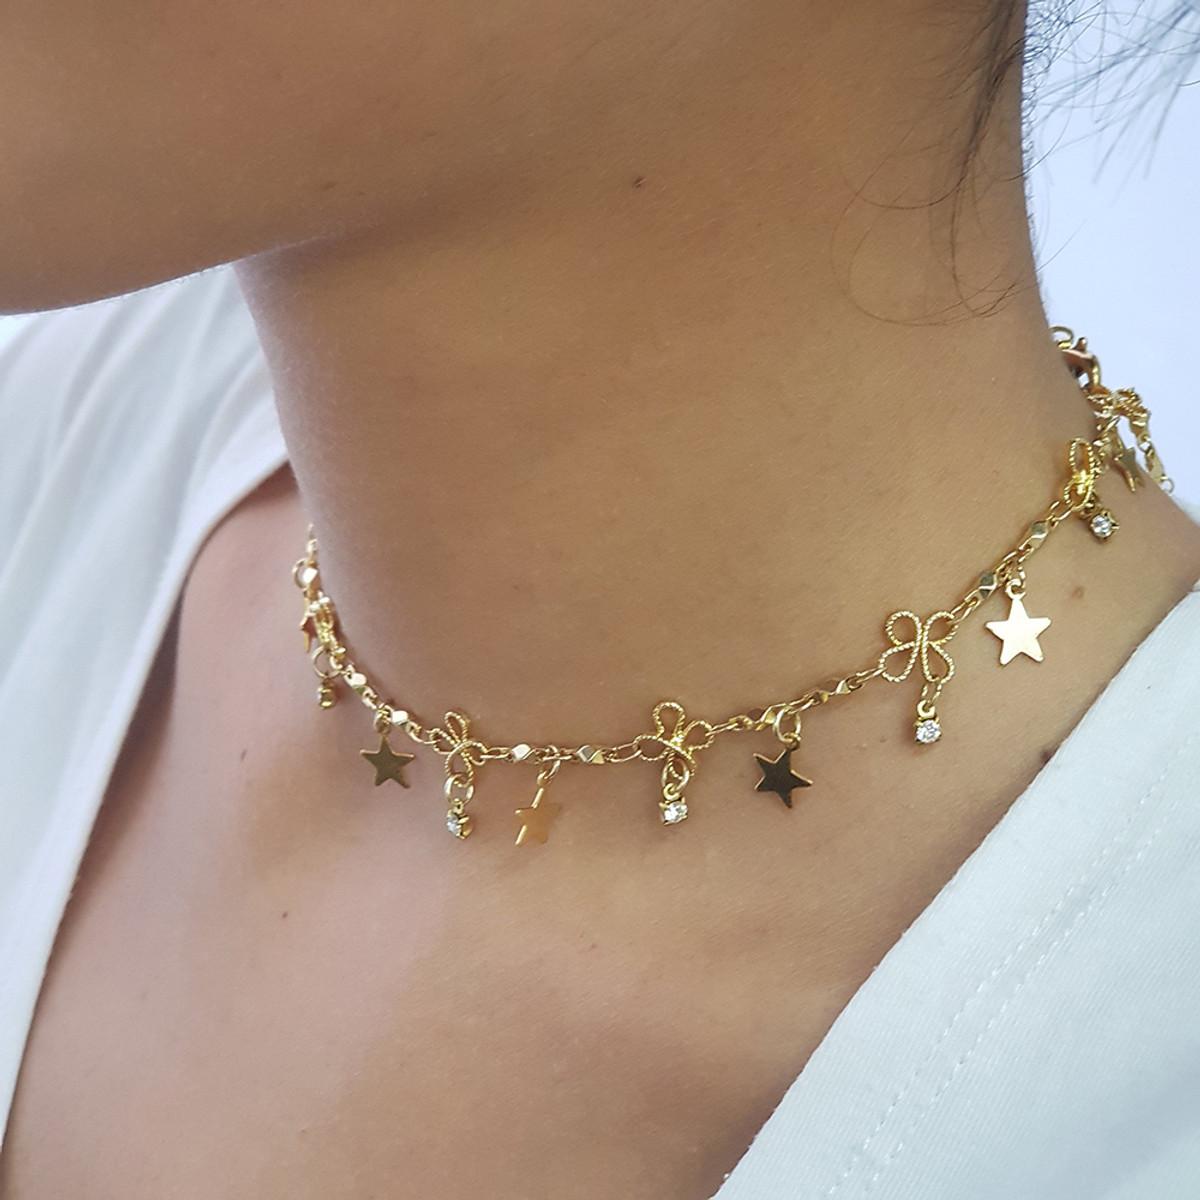 Anat Chosen Me Necklace